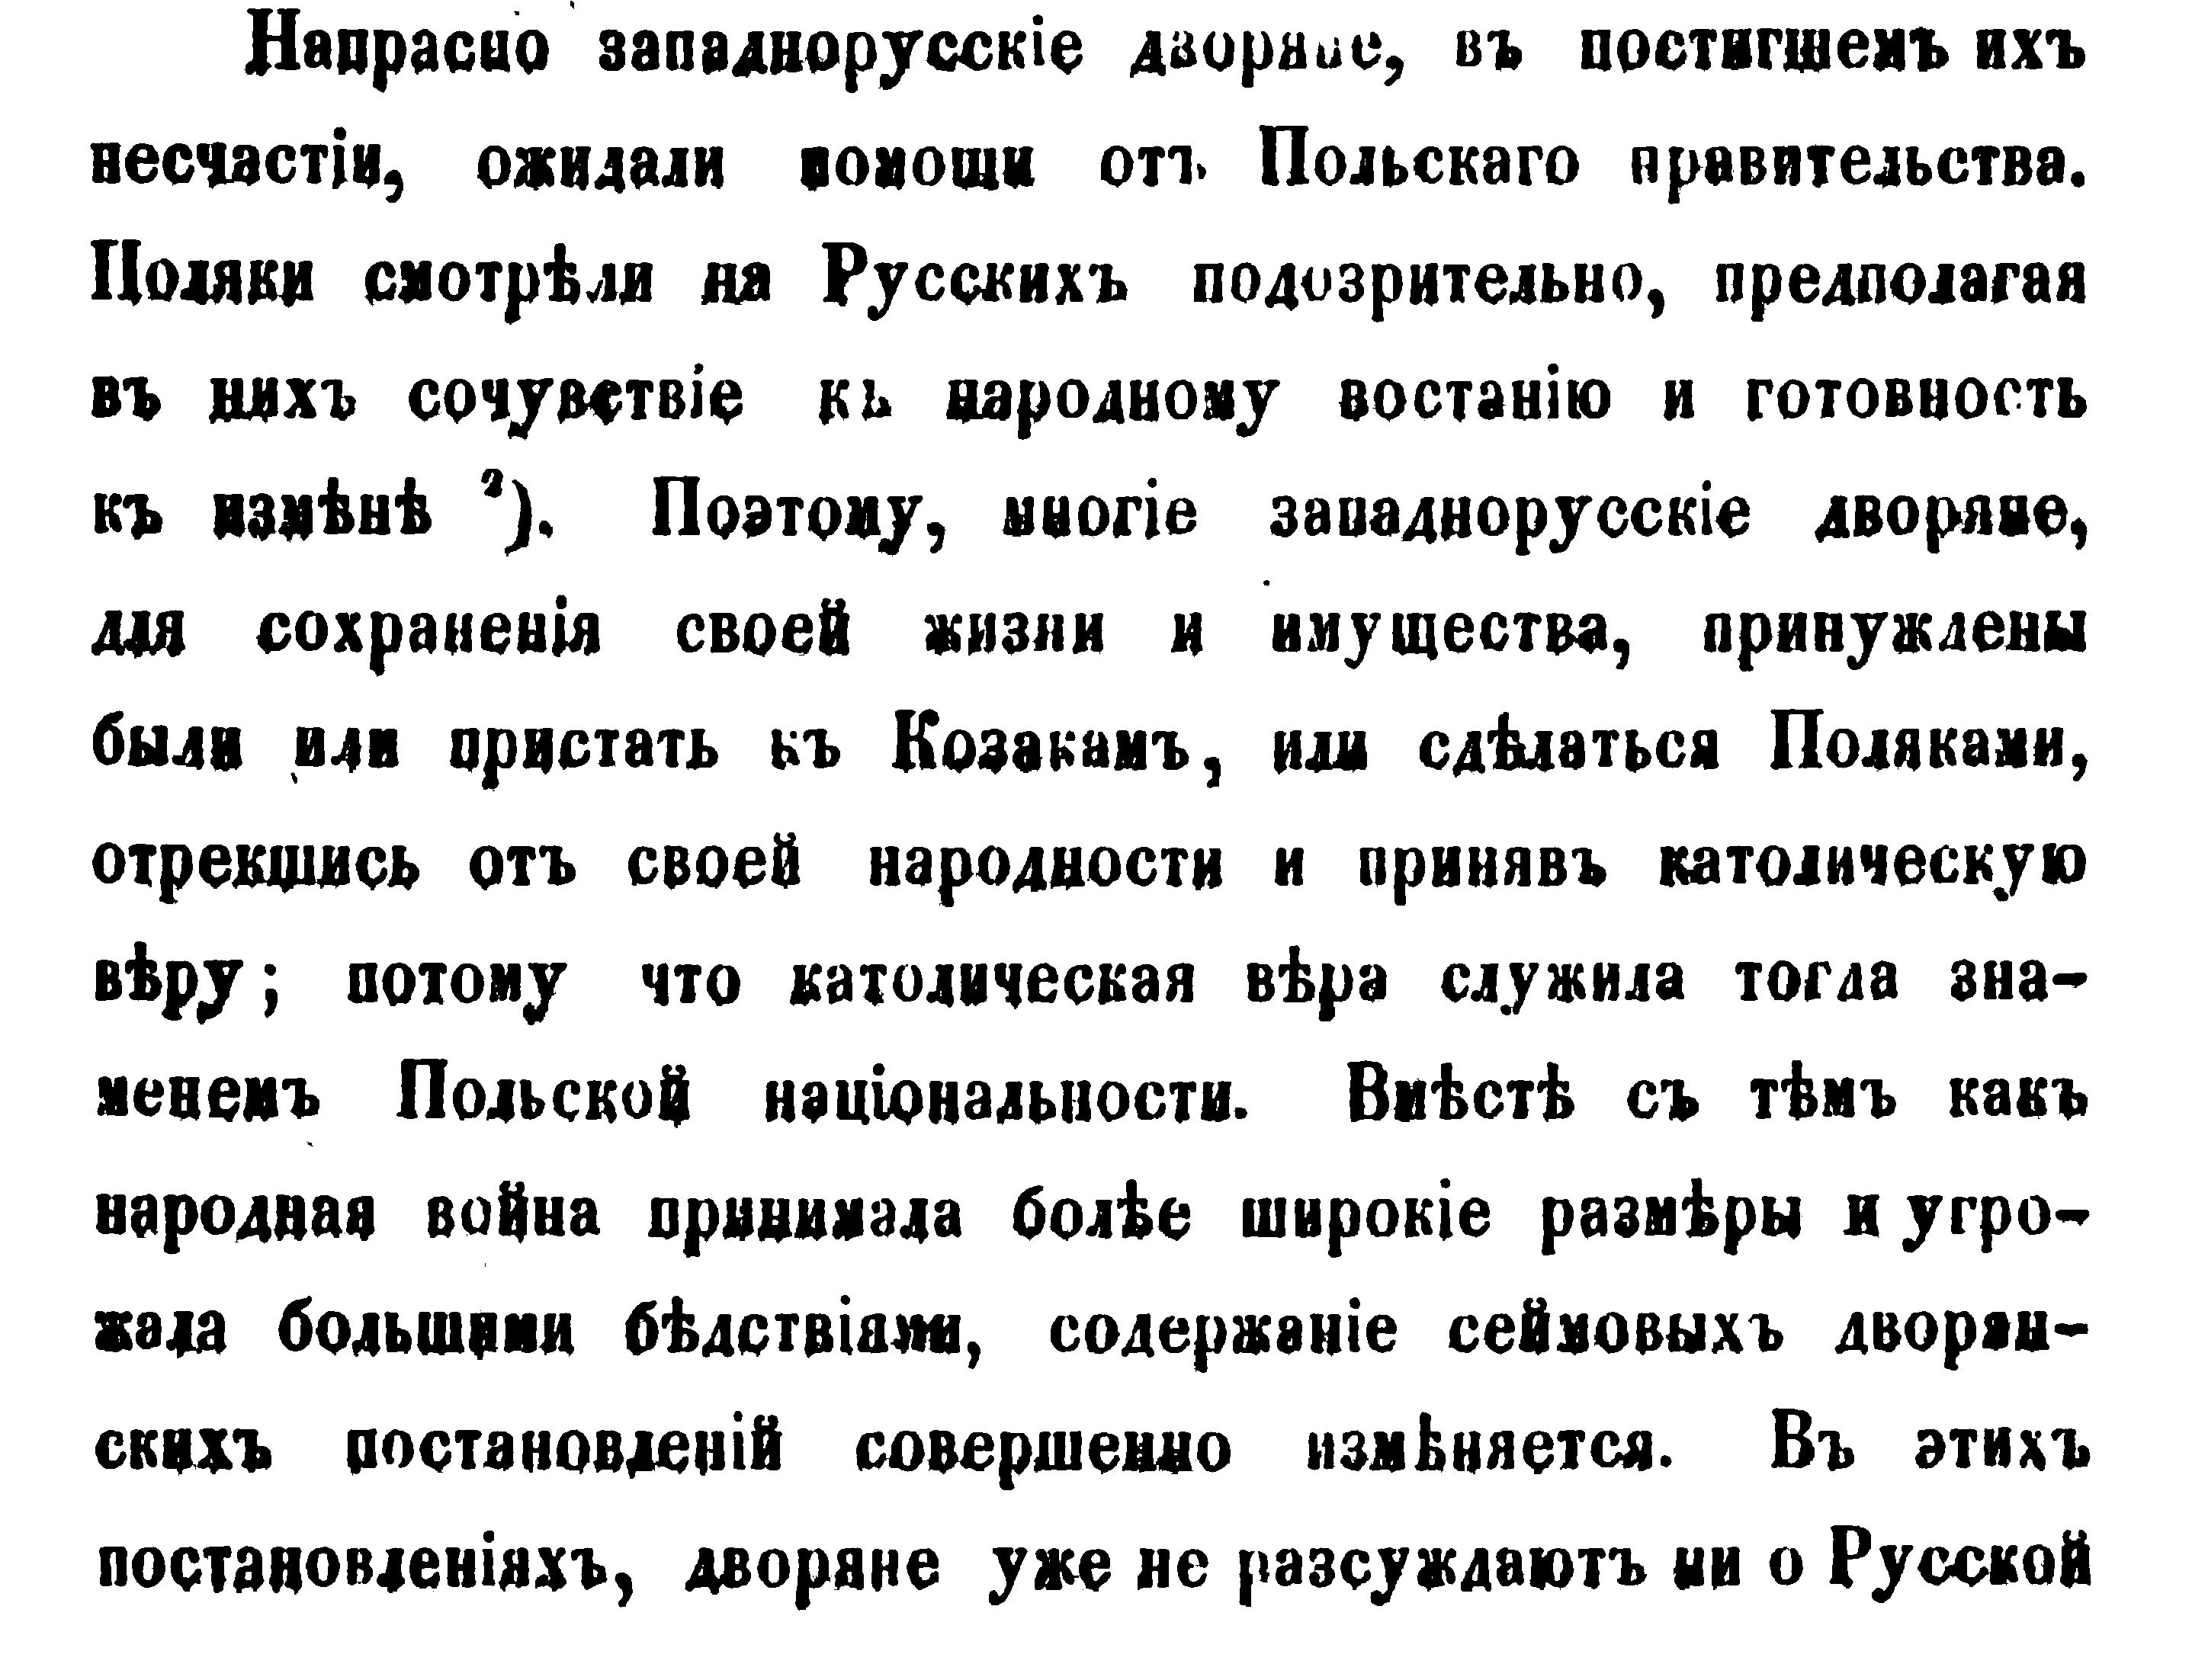 File 02 01 Arhiv Yugo Zapadnoj Rossii 02 01 1